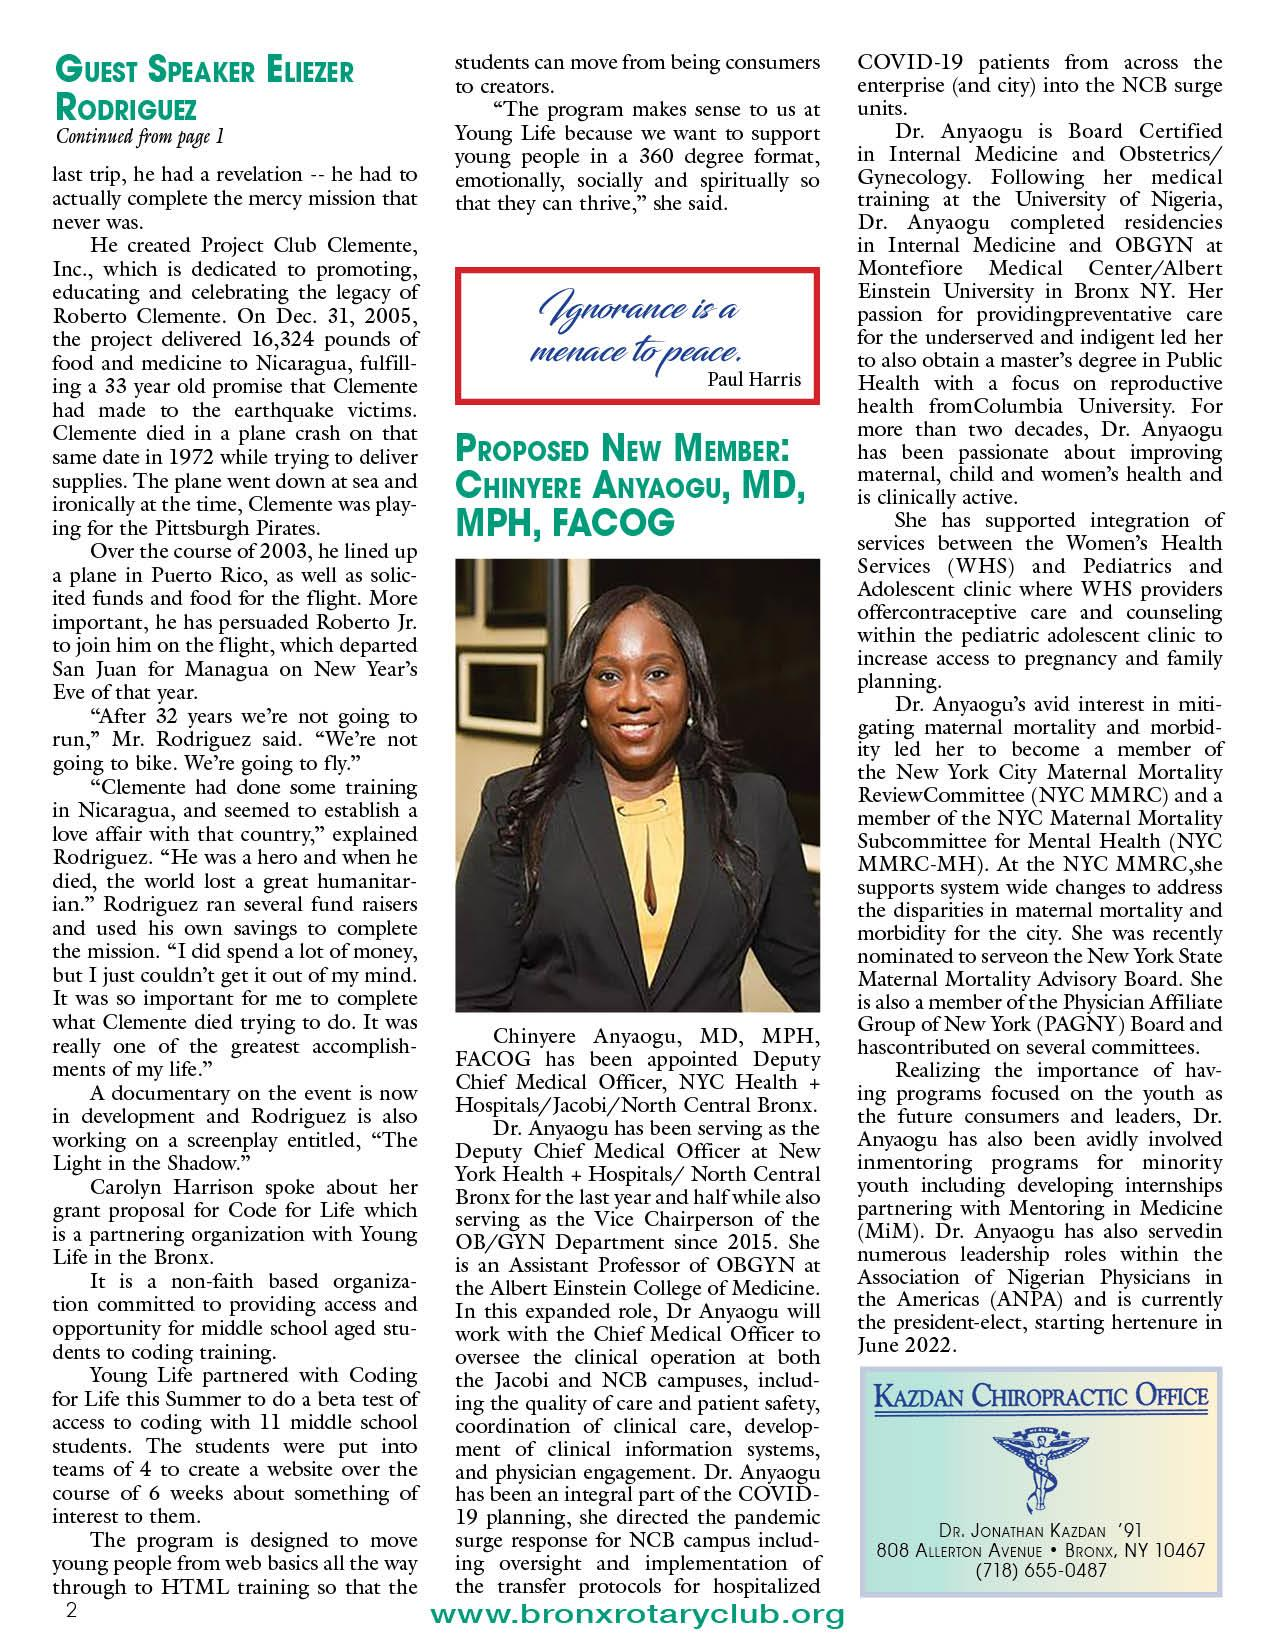 Tuesdays newsletter 1/12 & 1/19/2021 p2